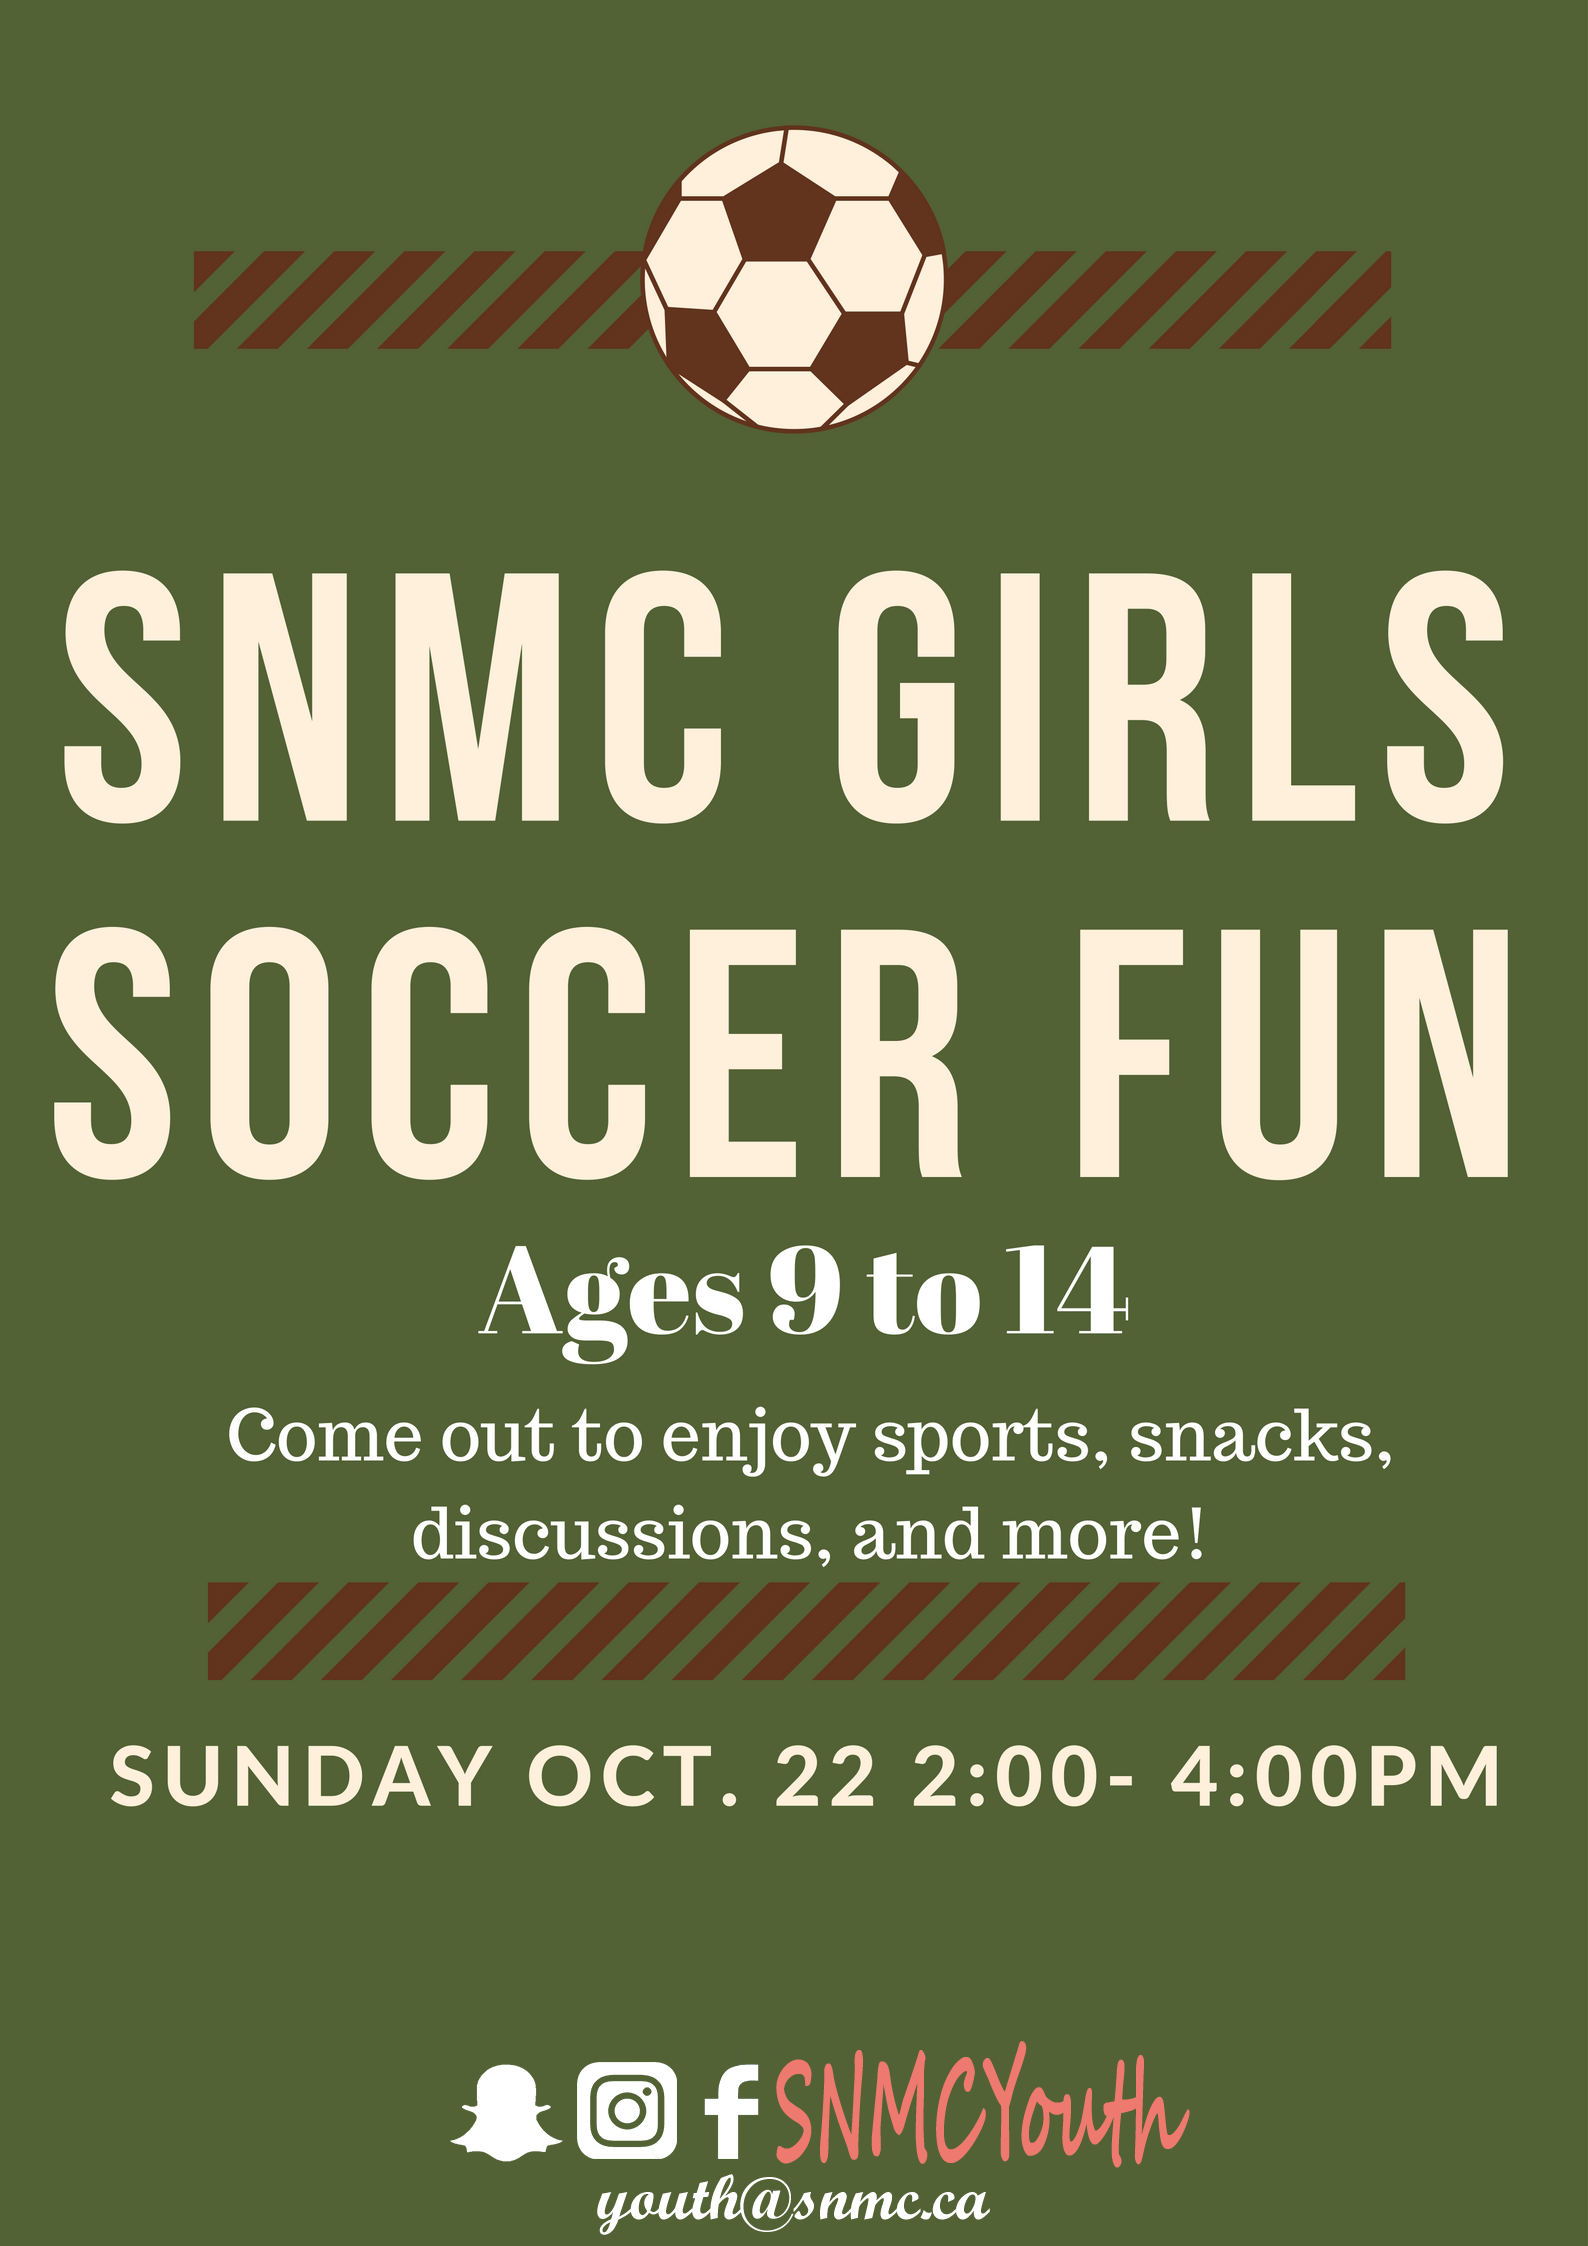 SNMC-girls-Soccer-fun